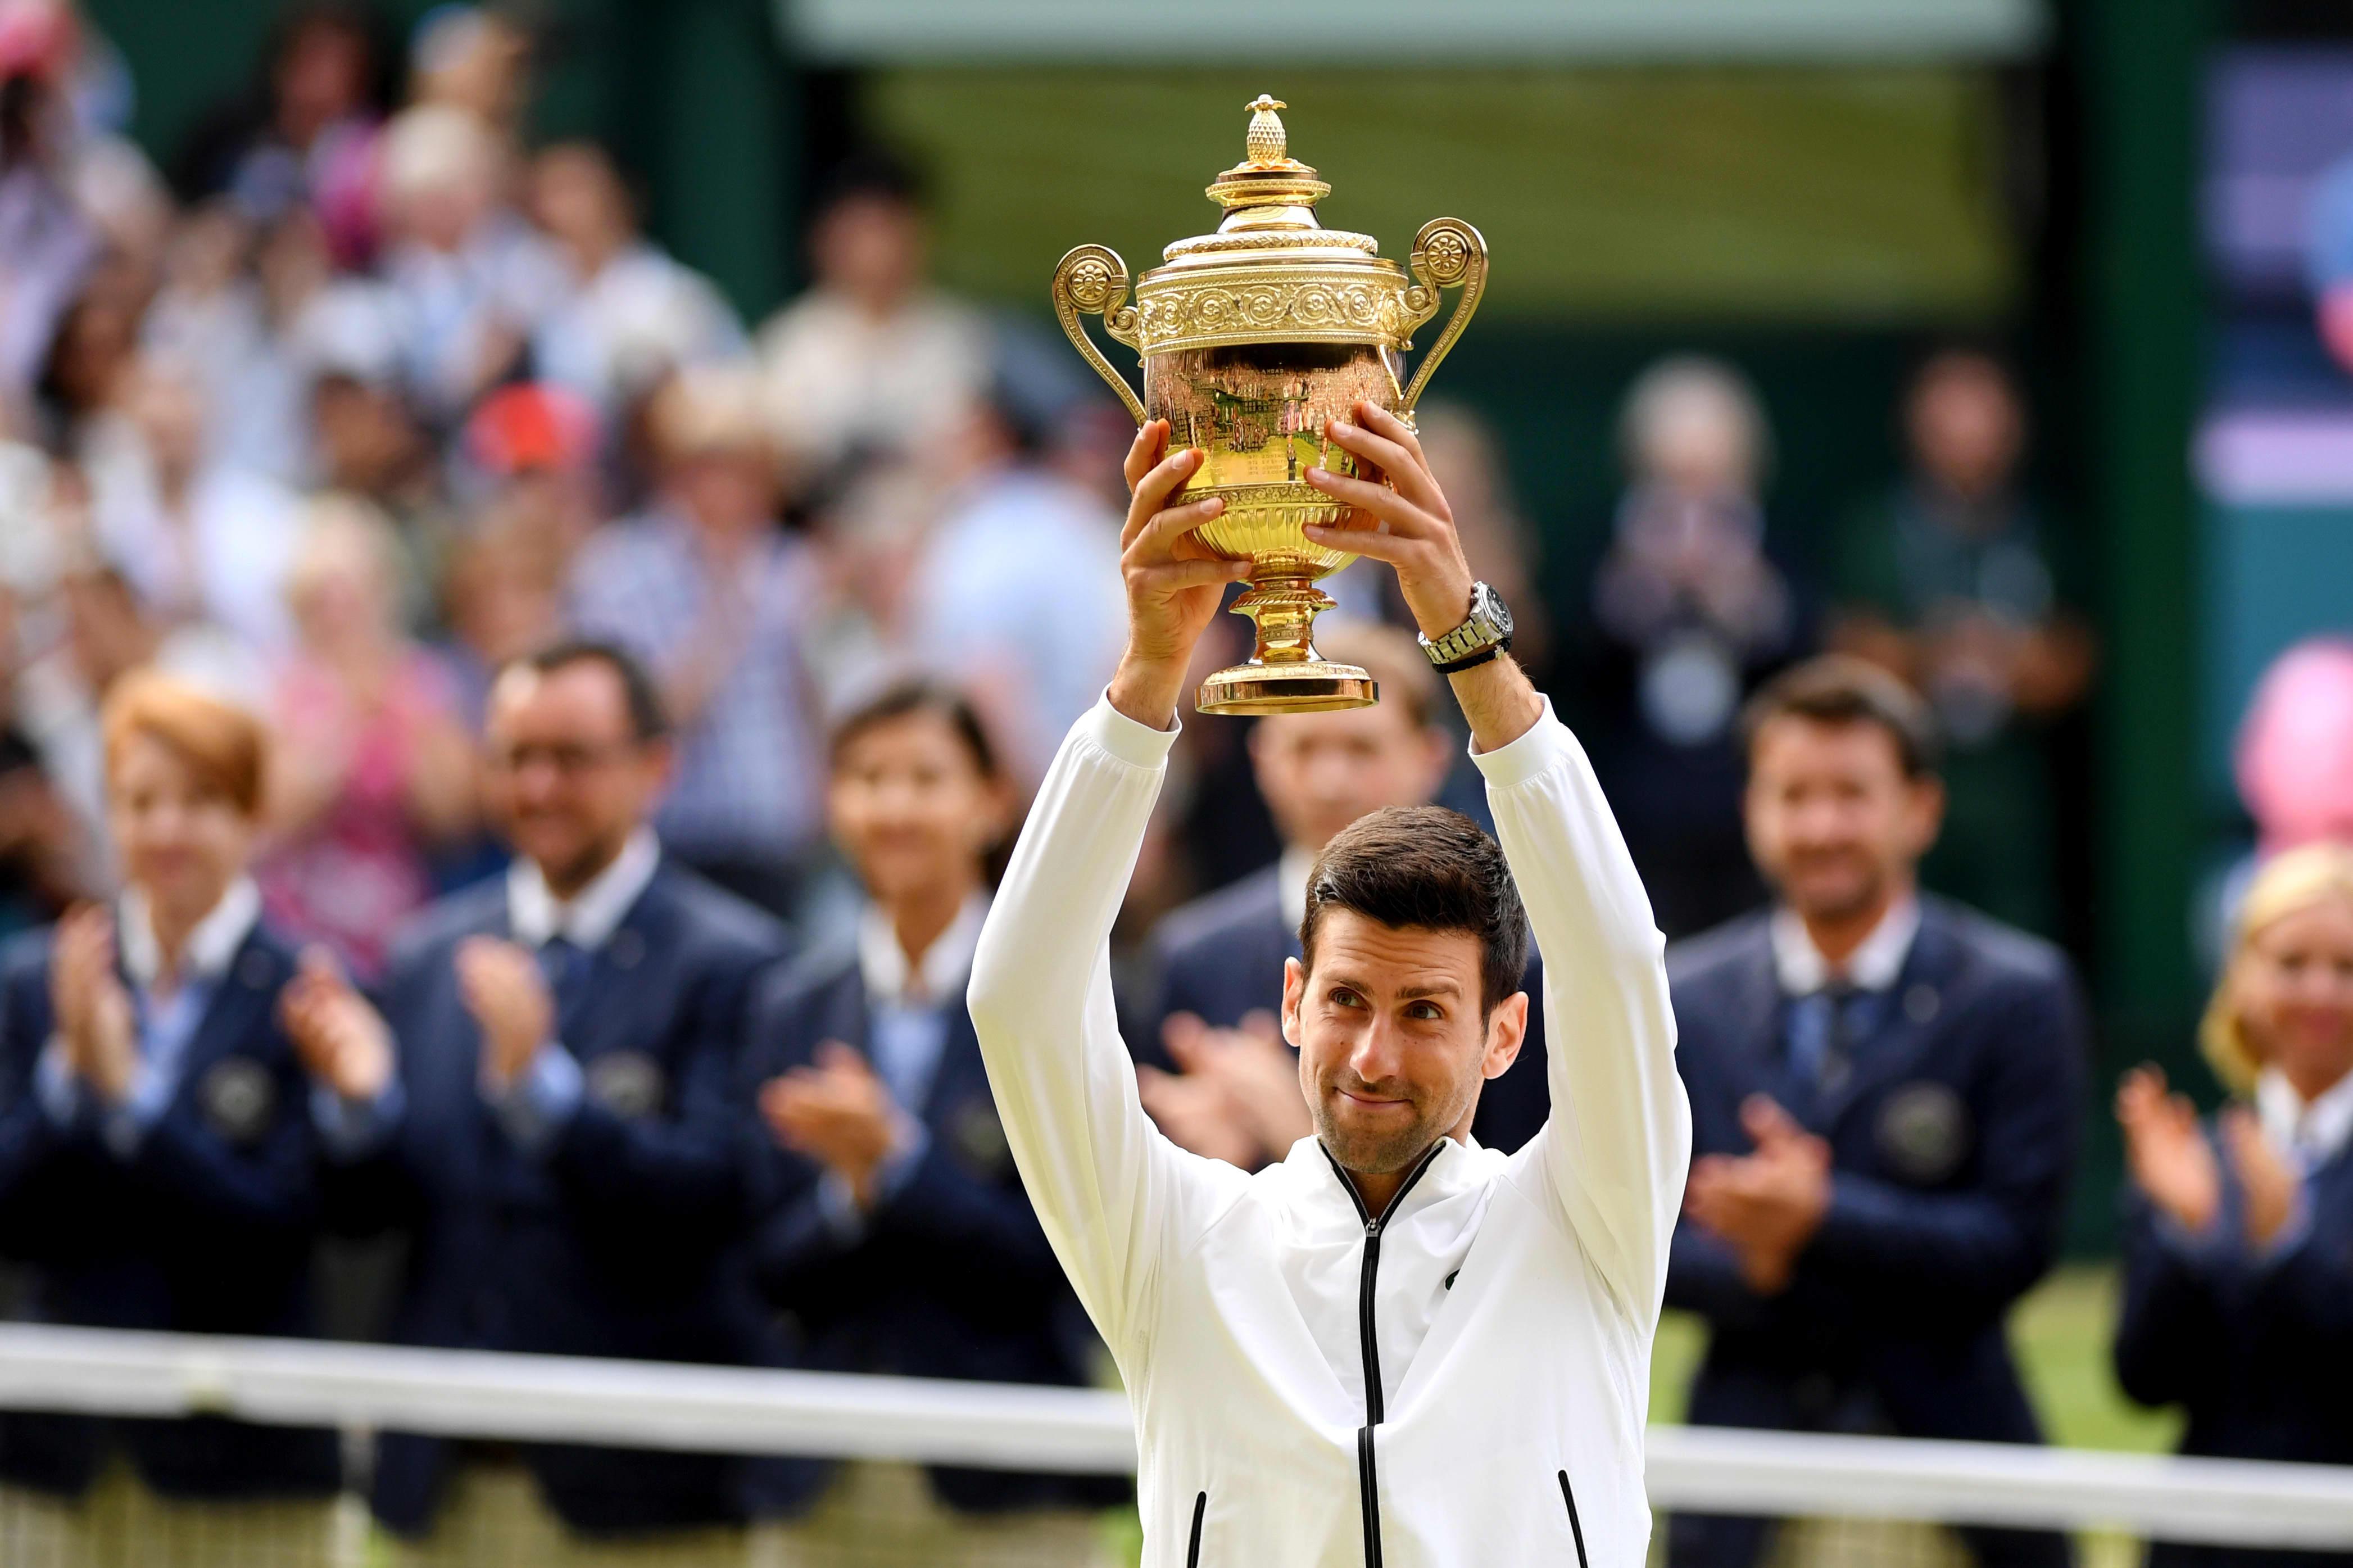 Wimbledon 2020 tennis championships canceled due to coronavirus